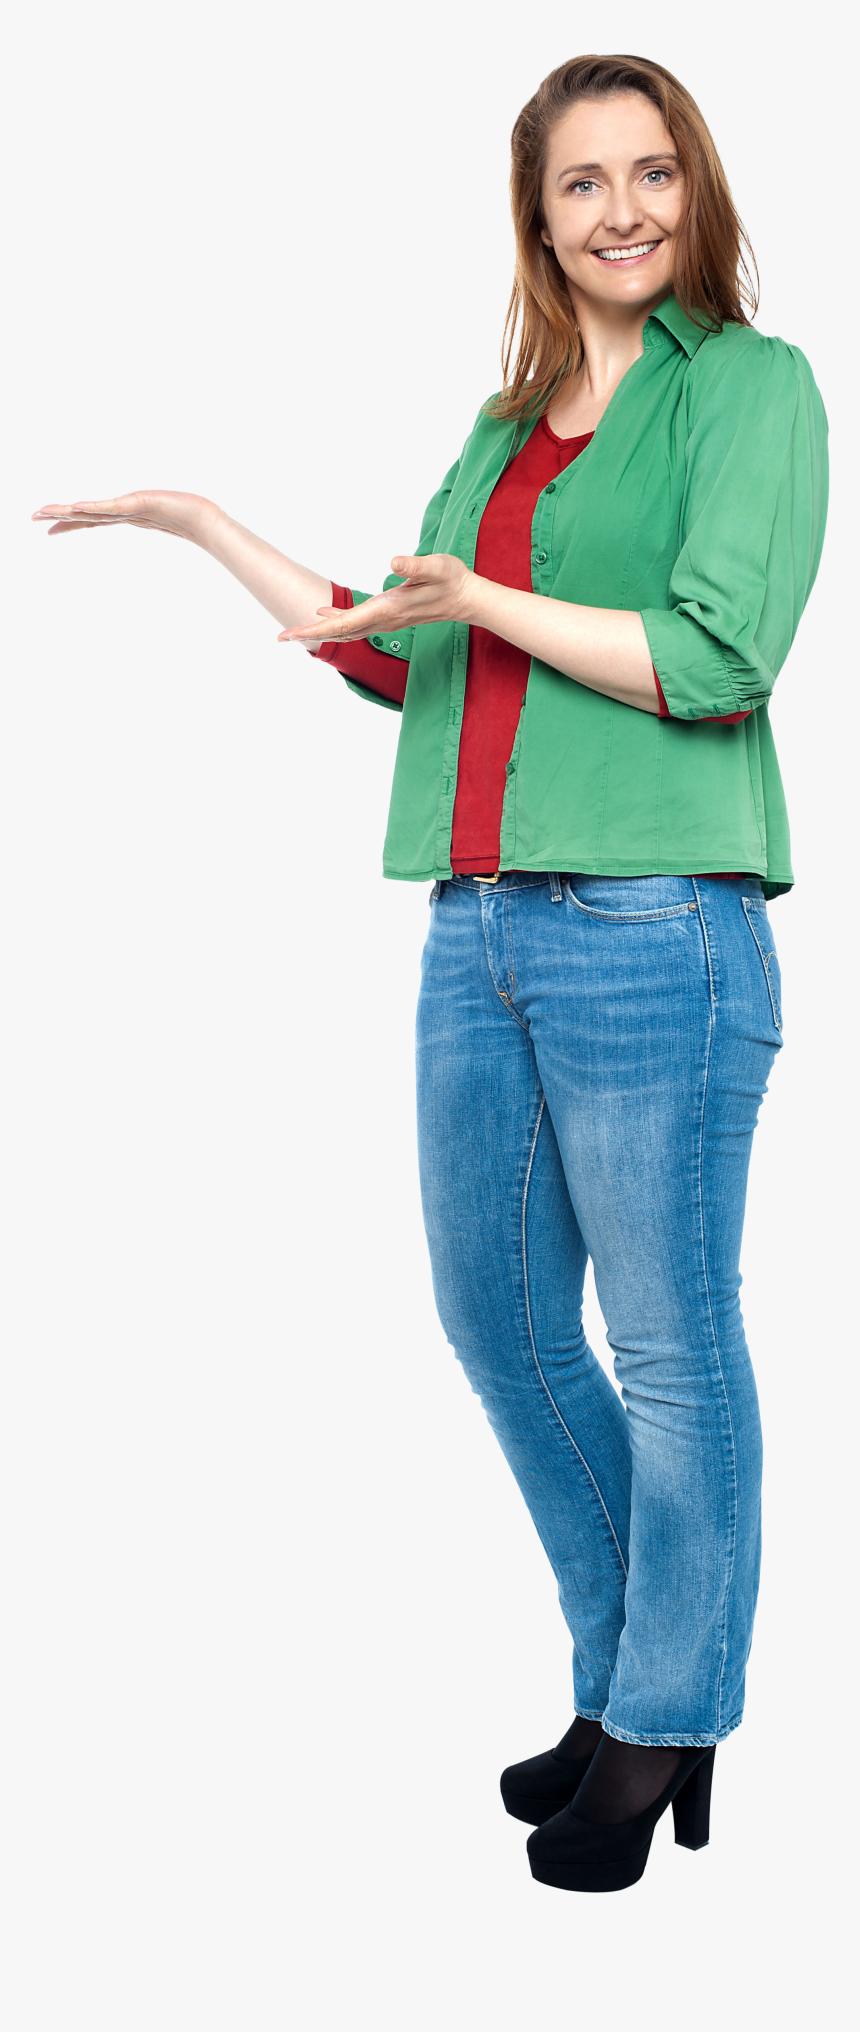 Women Pointing Left Png Image - Desimlocker Lg, Transparent Png, Free Download